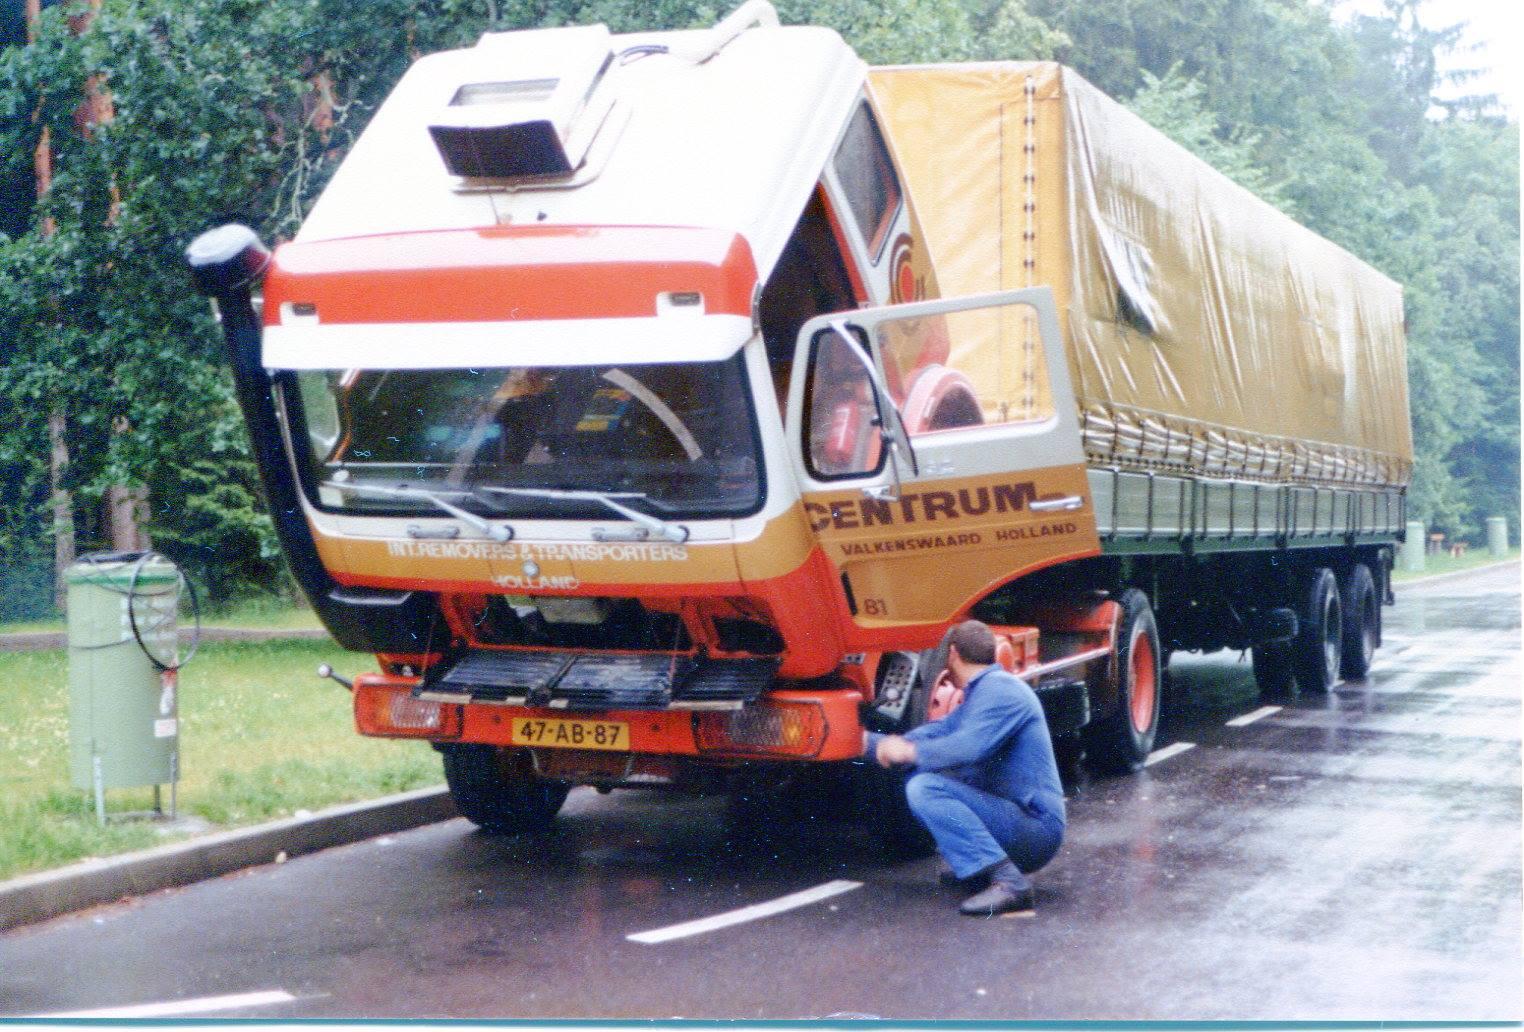 Hans-Anthonise-midden-oosten-transport-11